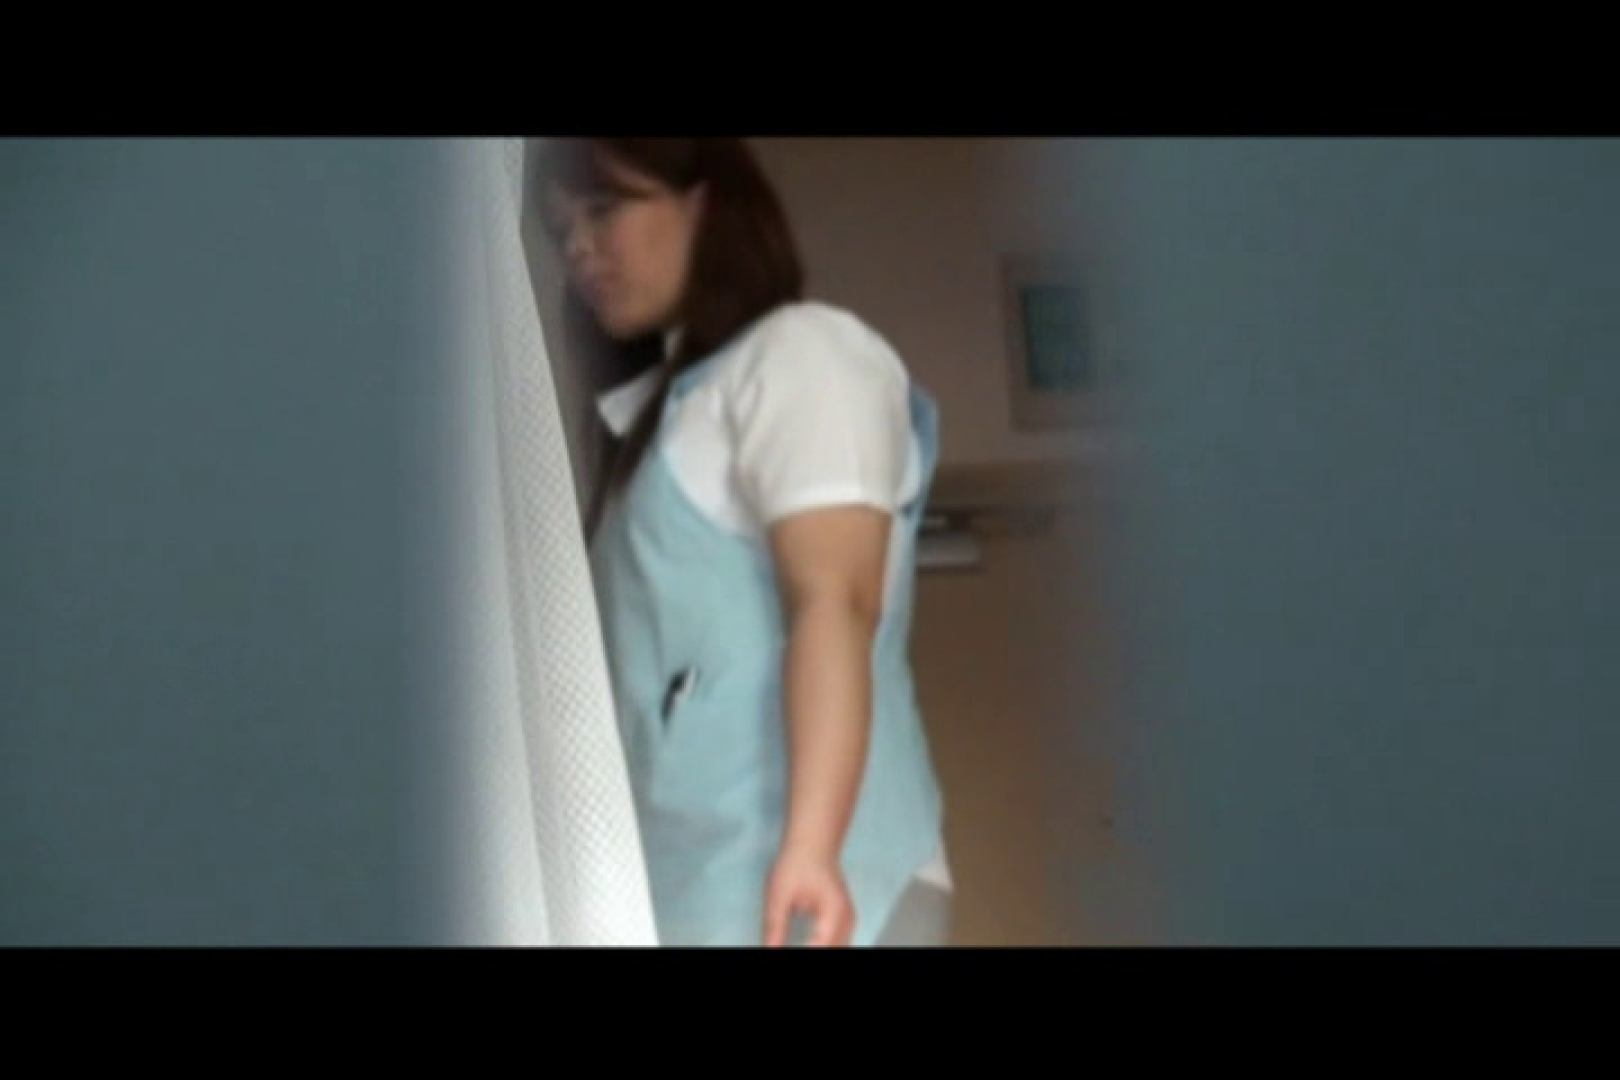 独占配信!無修正! 看護女子寮 vol.12 ナースのエロ動画 SEX無修正画像 78PIX 2